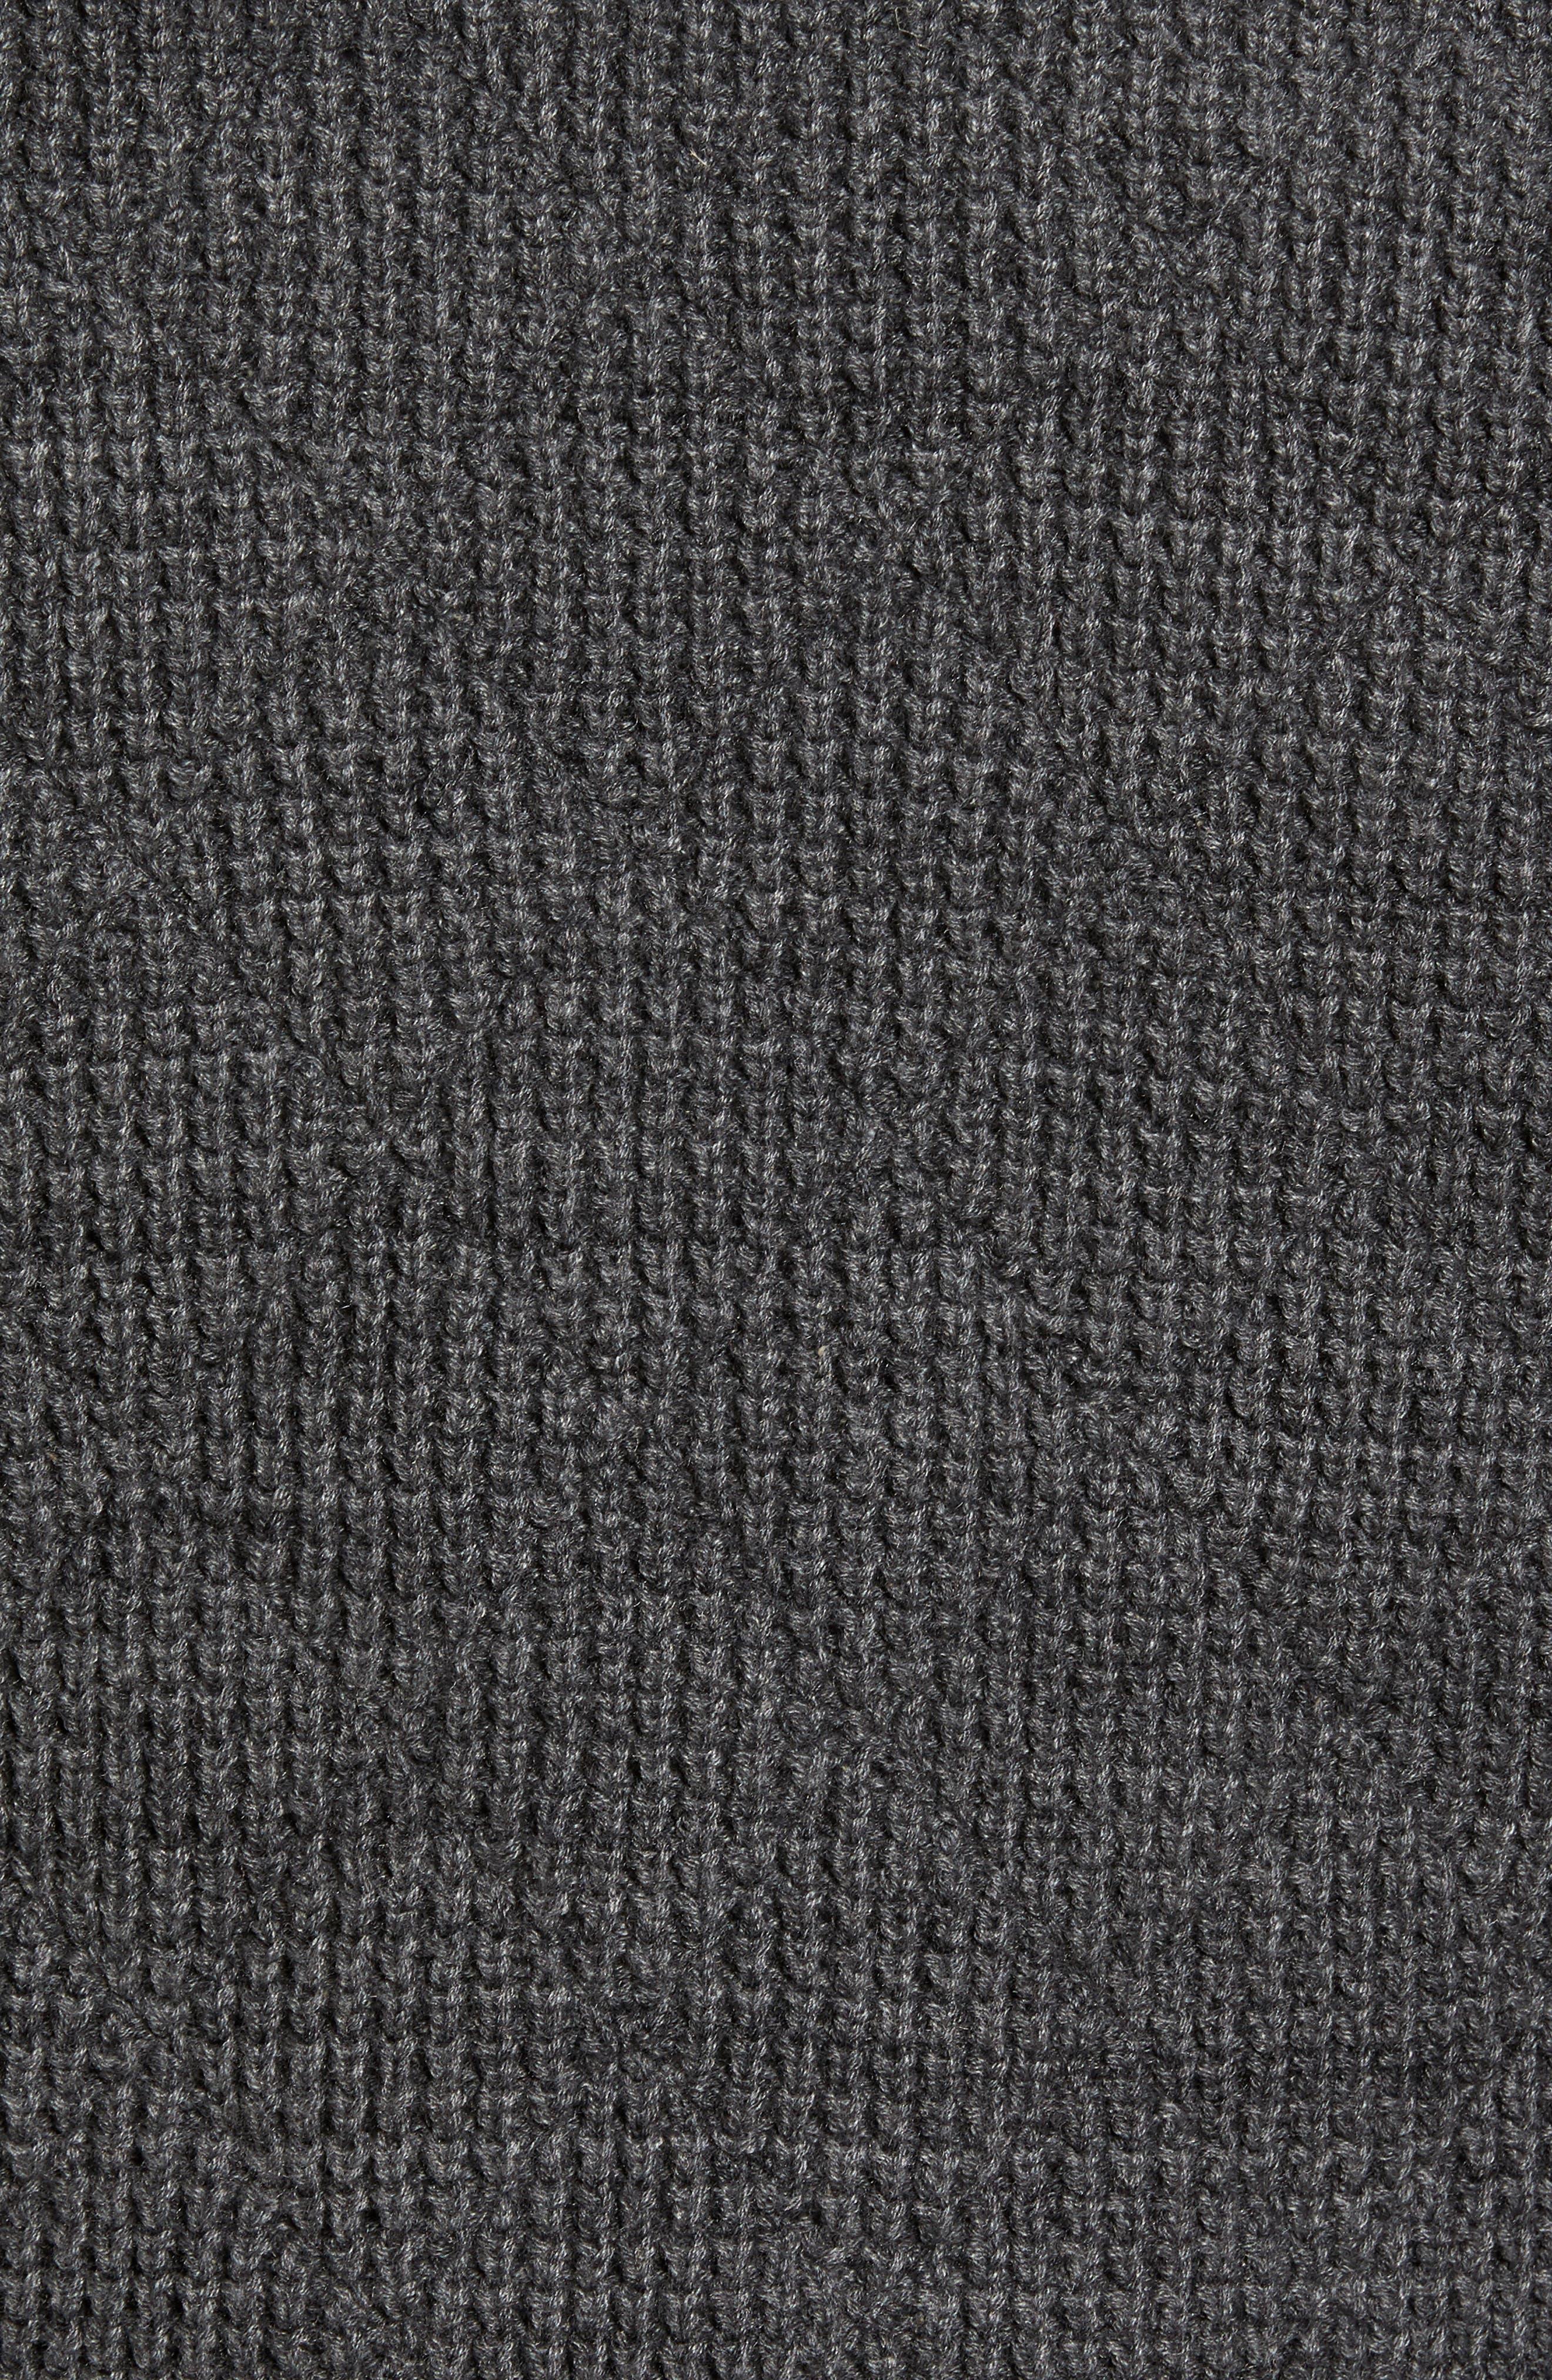 Mixed Media Full Zip Sweater,                             Alternate thumbnail 5, color,                             Grey Dark Charcoal Spacedye